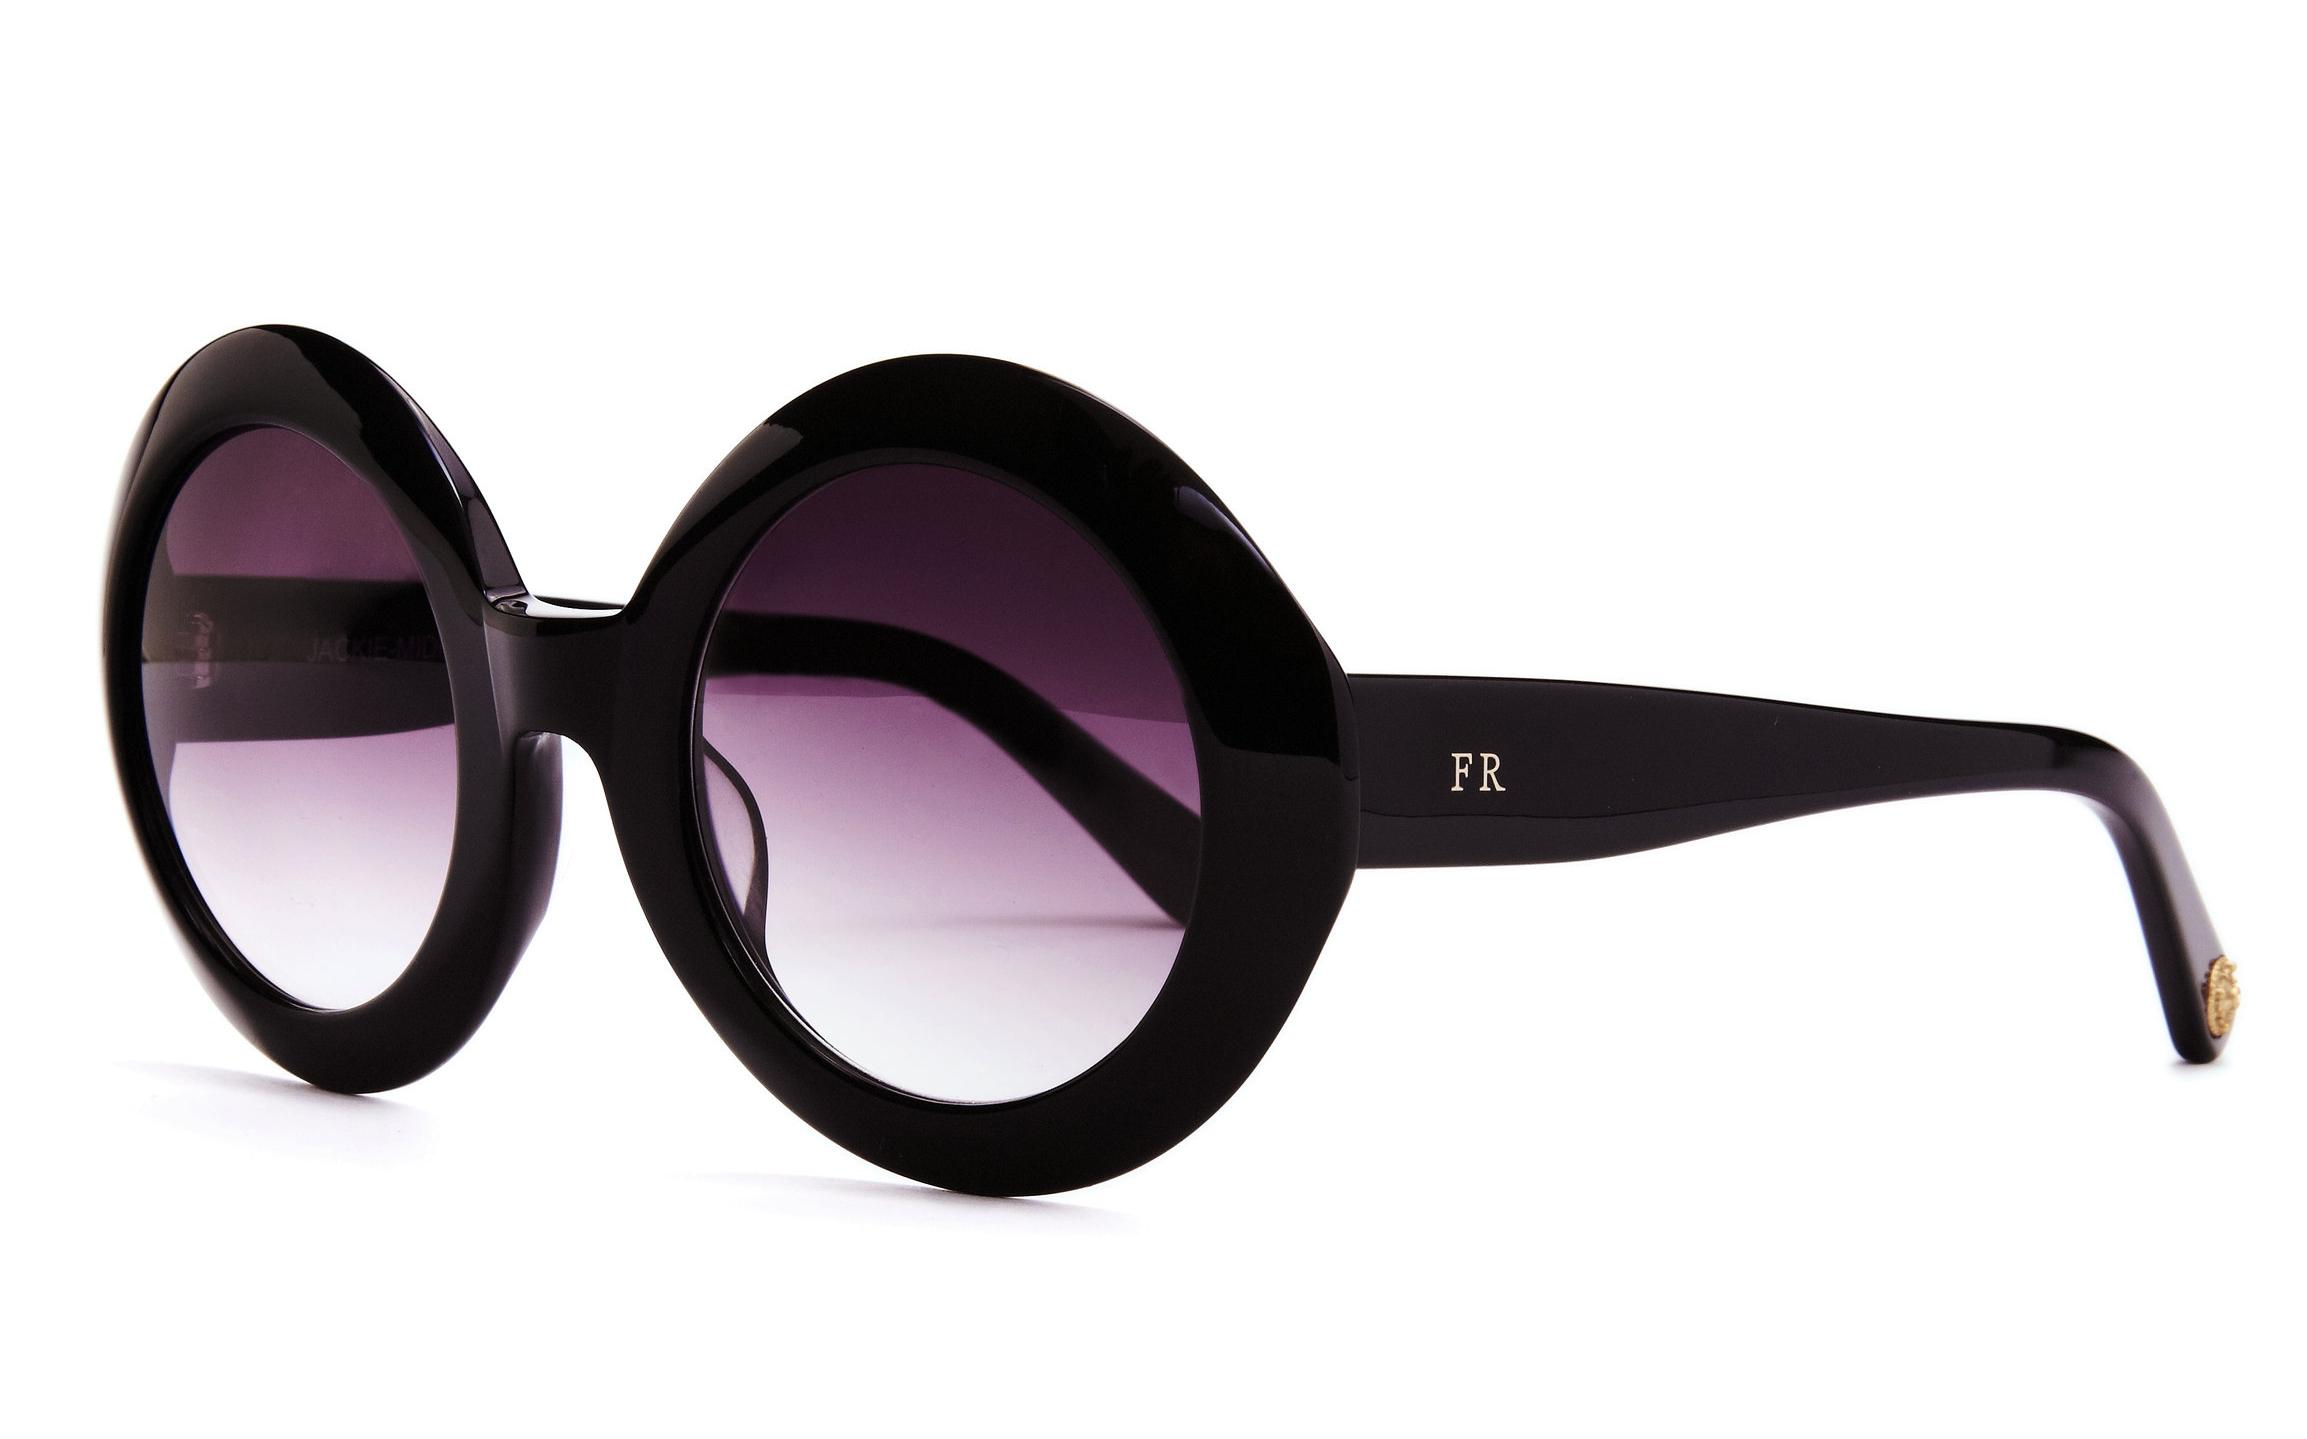 Sunglasses-3_0005 1.jpg